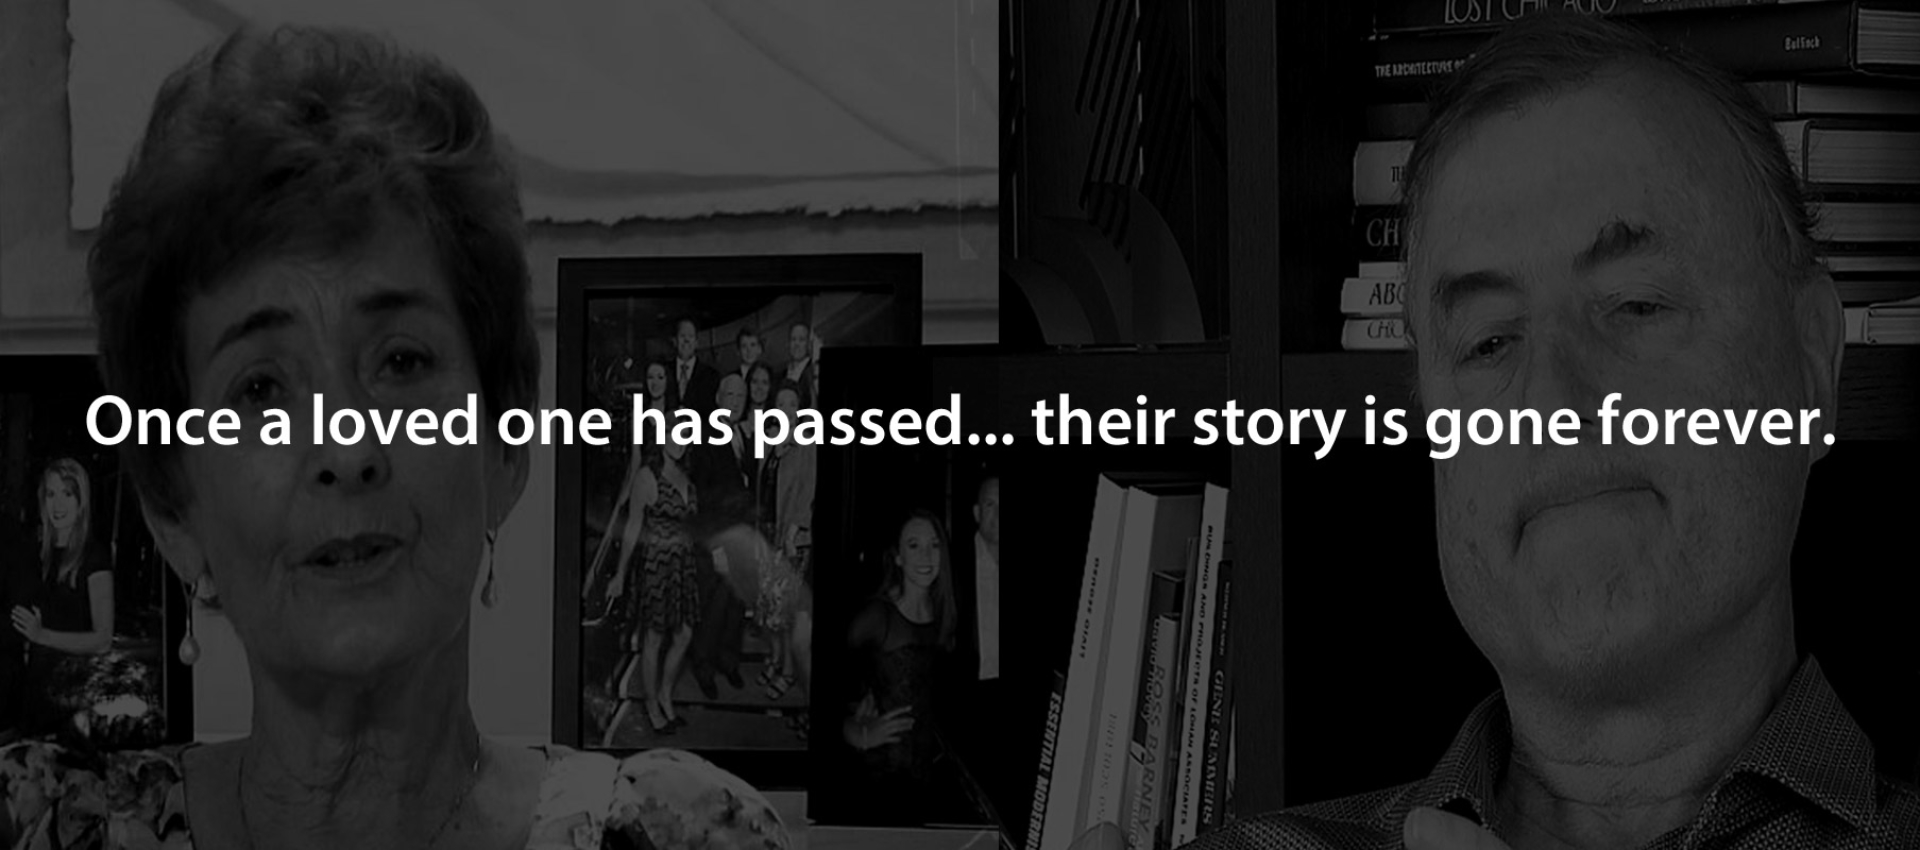 personalhistoryinterviews-slide007b